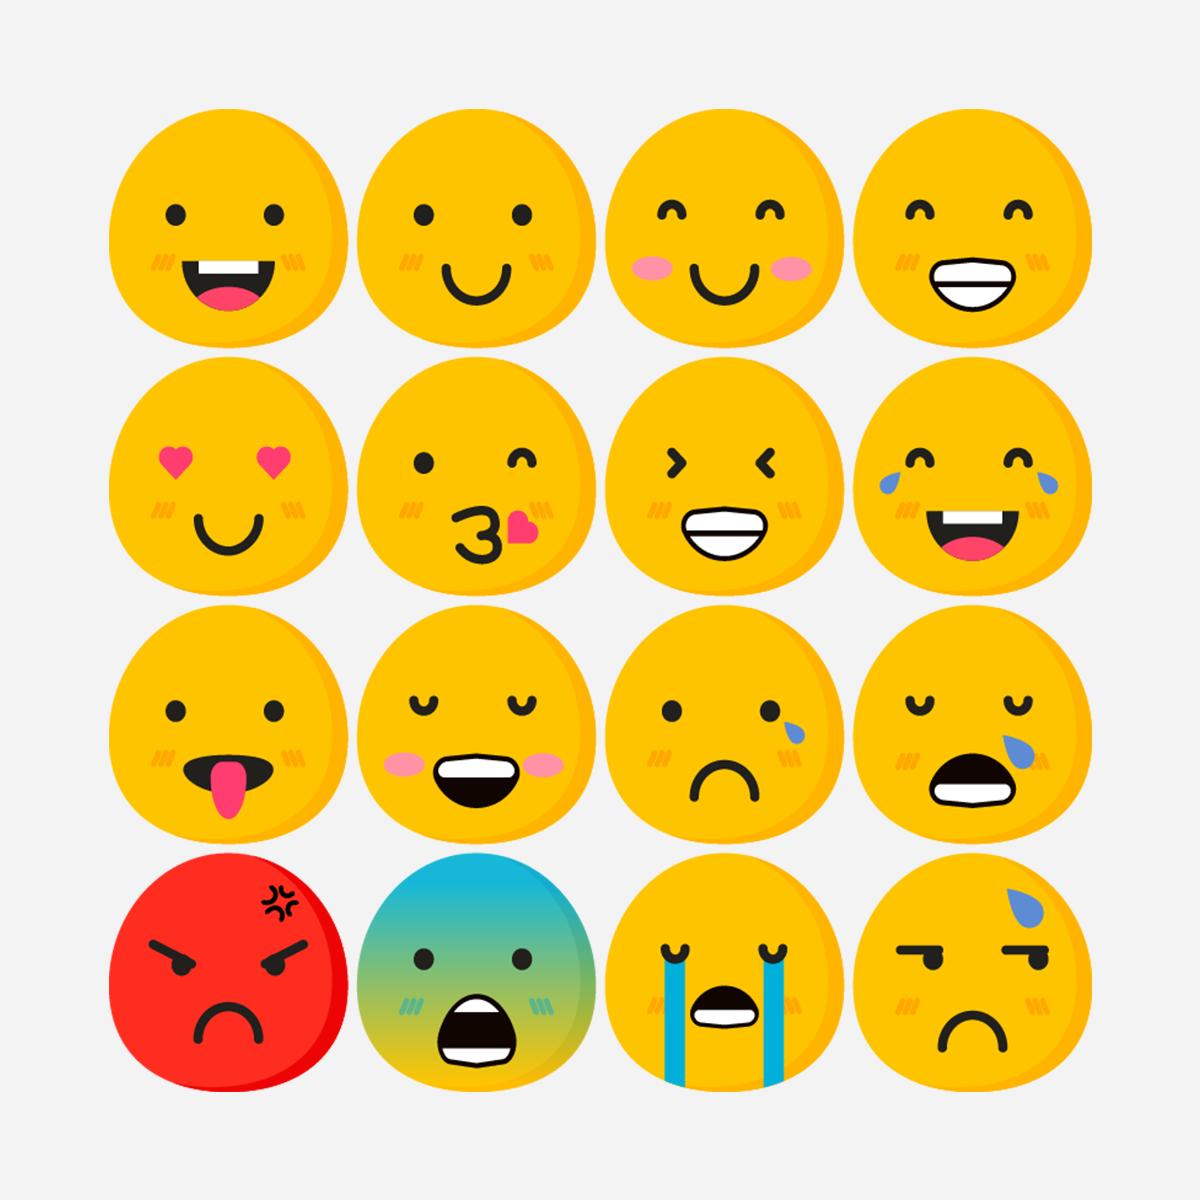 Free Flat Emoji Pack (EPS, SVG, PSD, PNG)